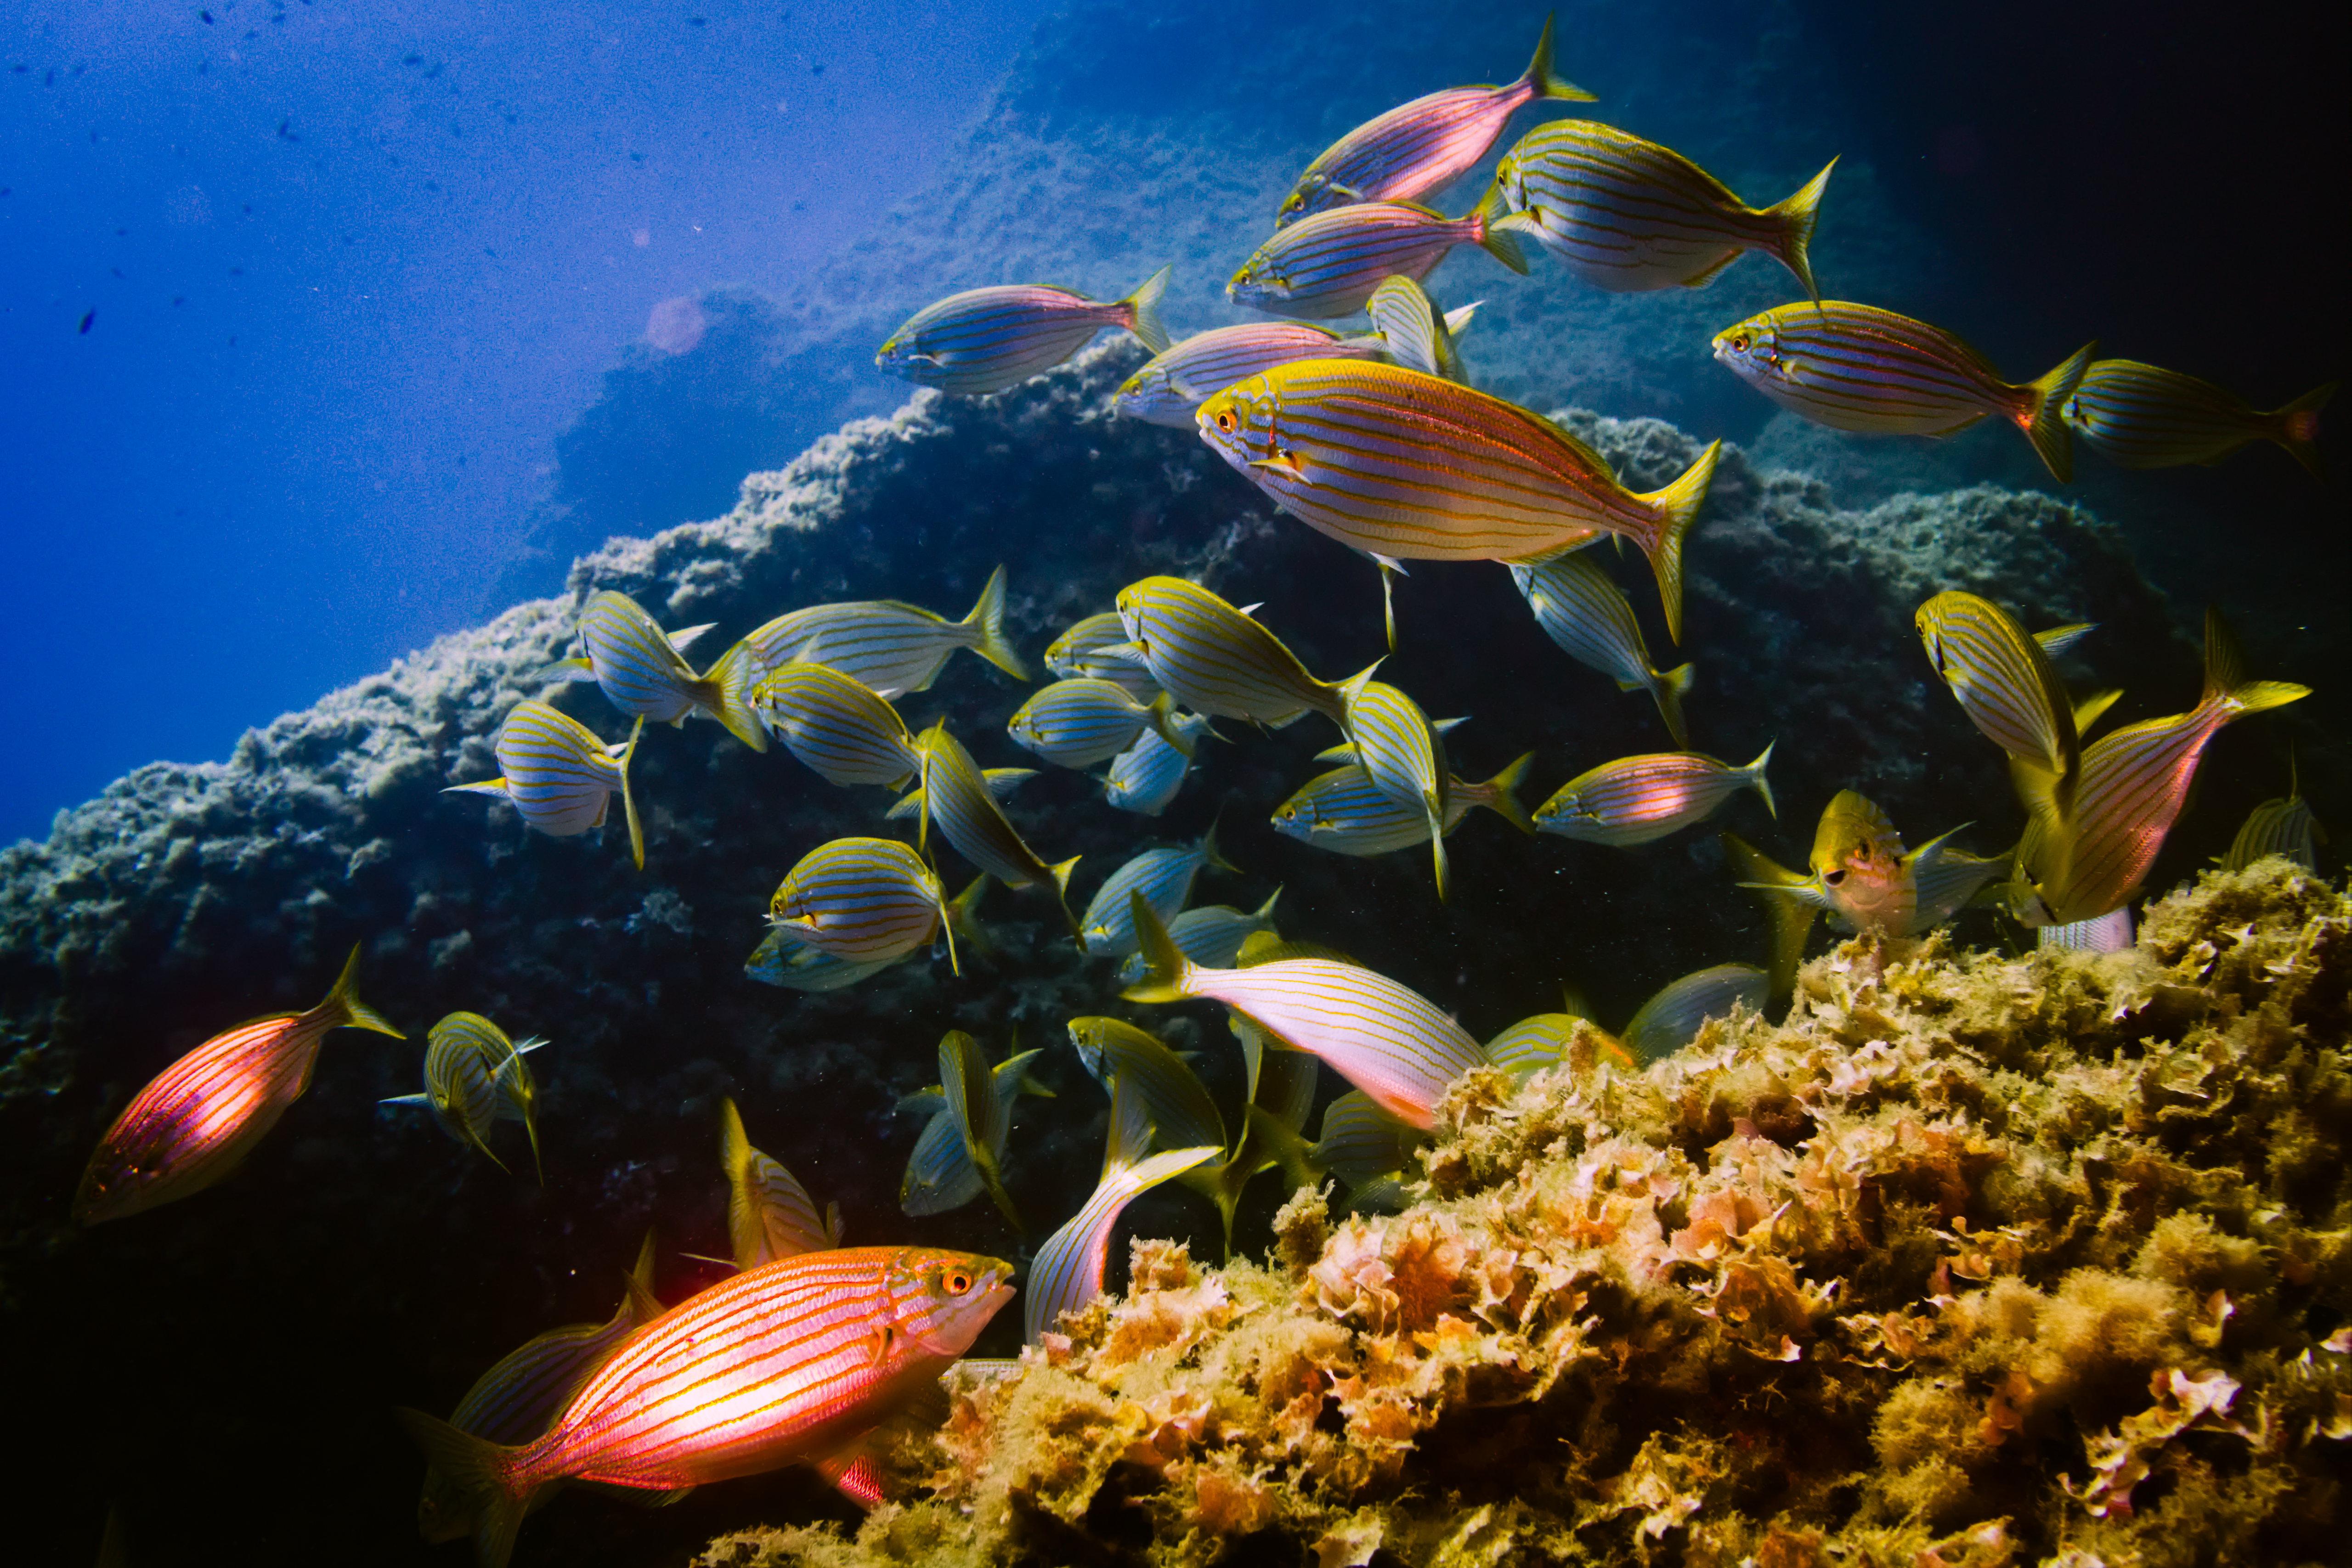 75072 download wallpaper Animals, Sarpa, Aquarium, Seaweed, Algae, Water, Fishes screensavers and pictures for free